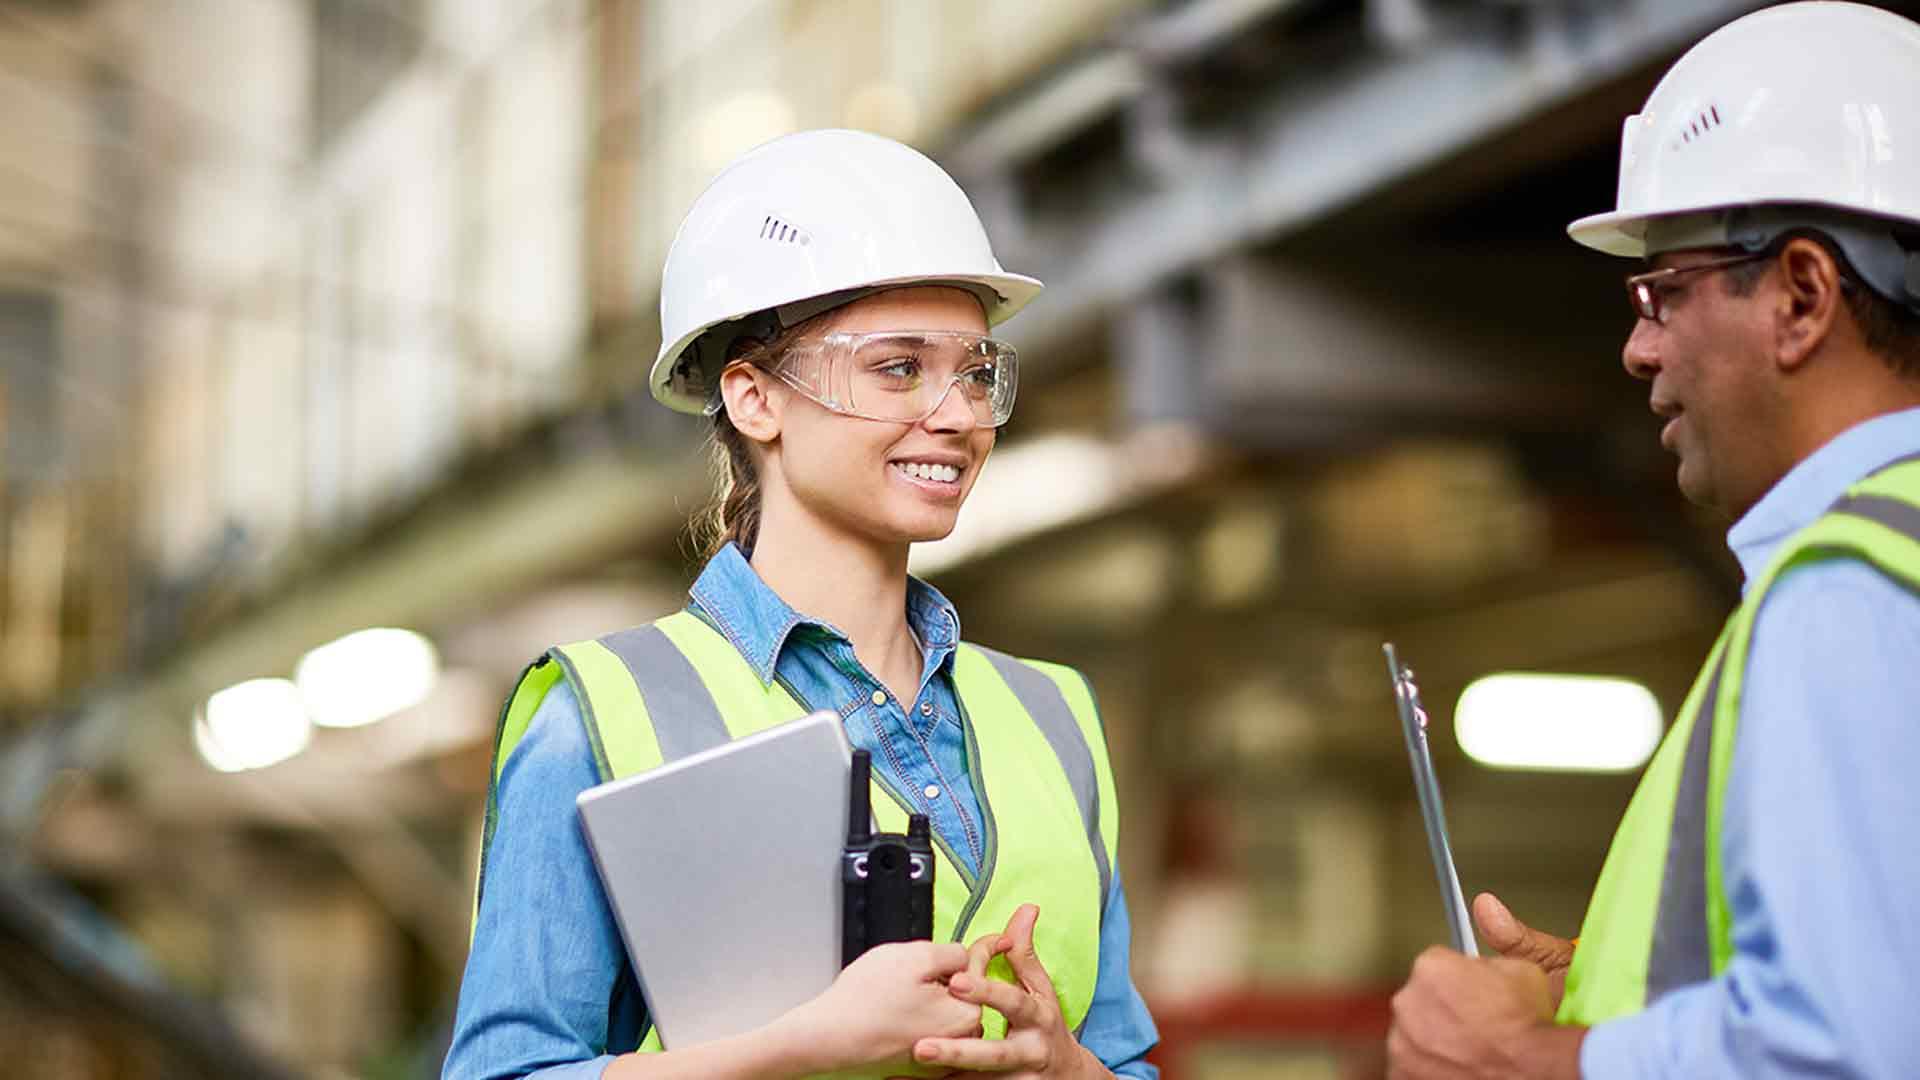 Bauarbeiter Lehrling